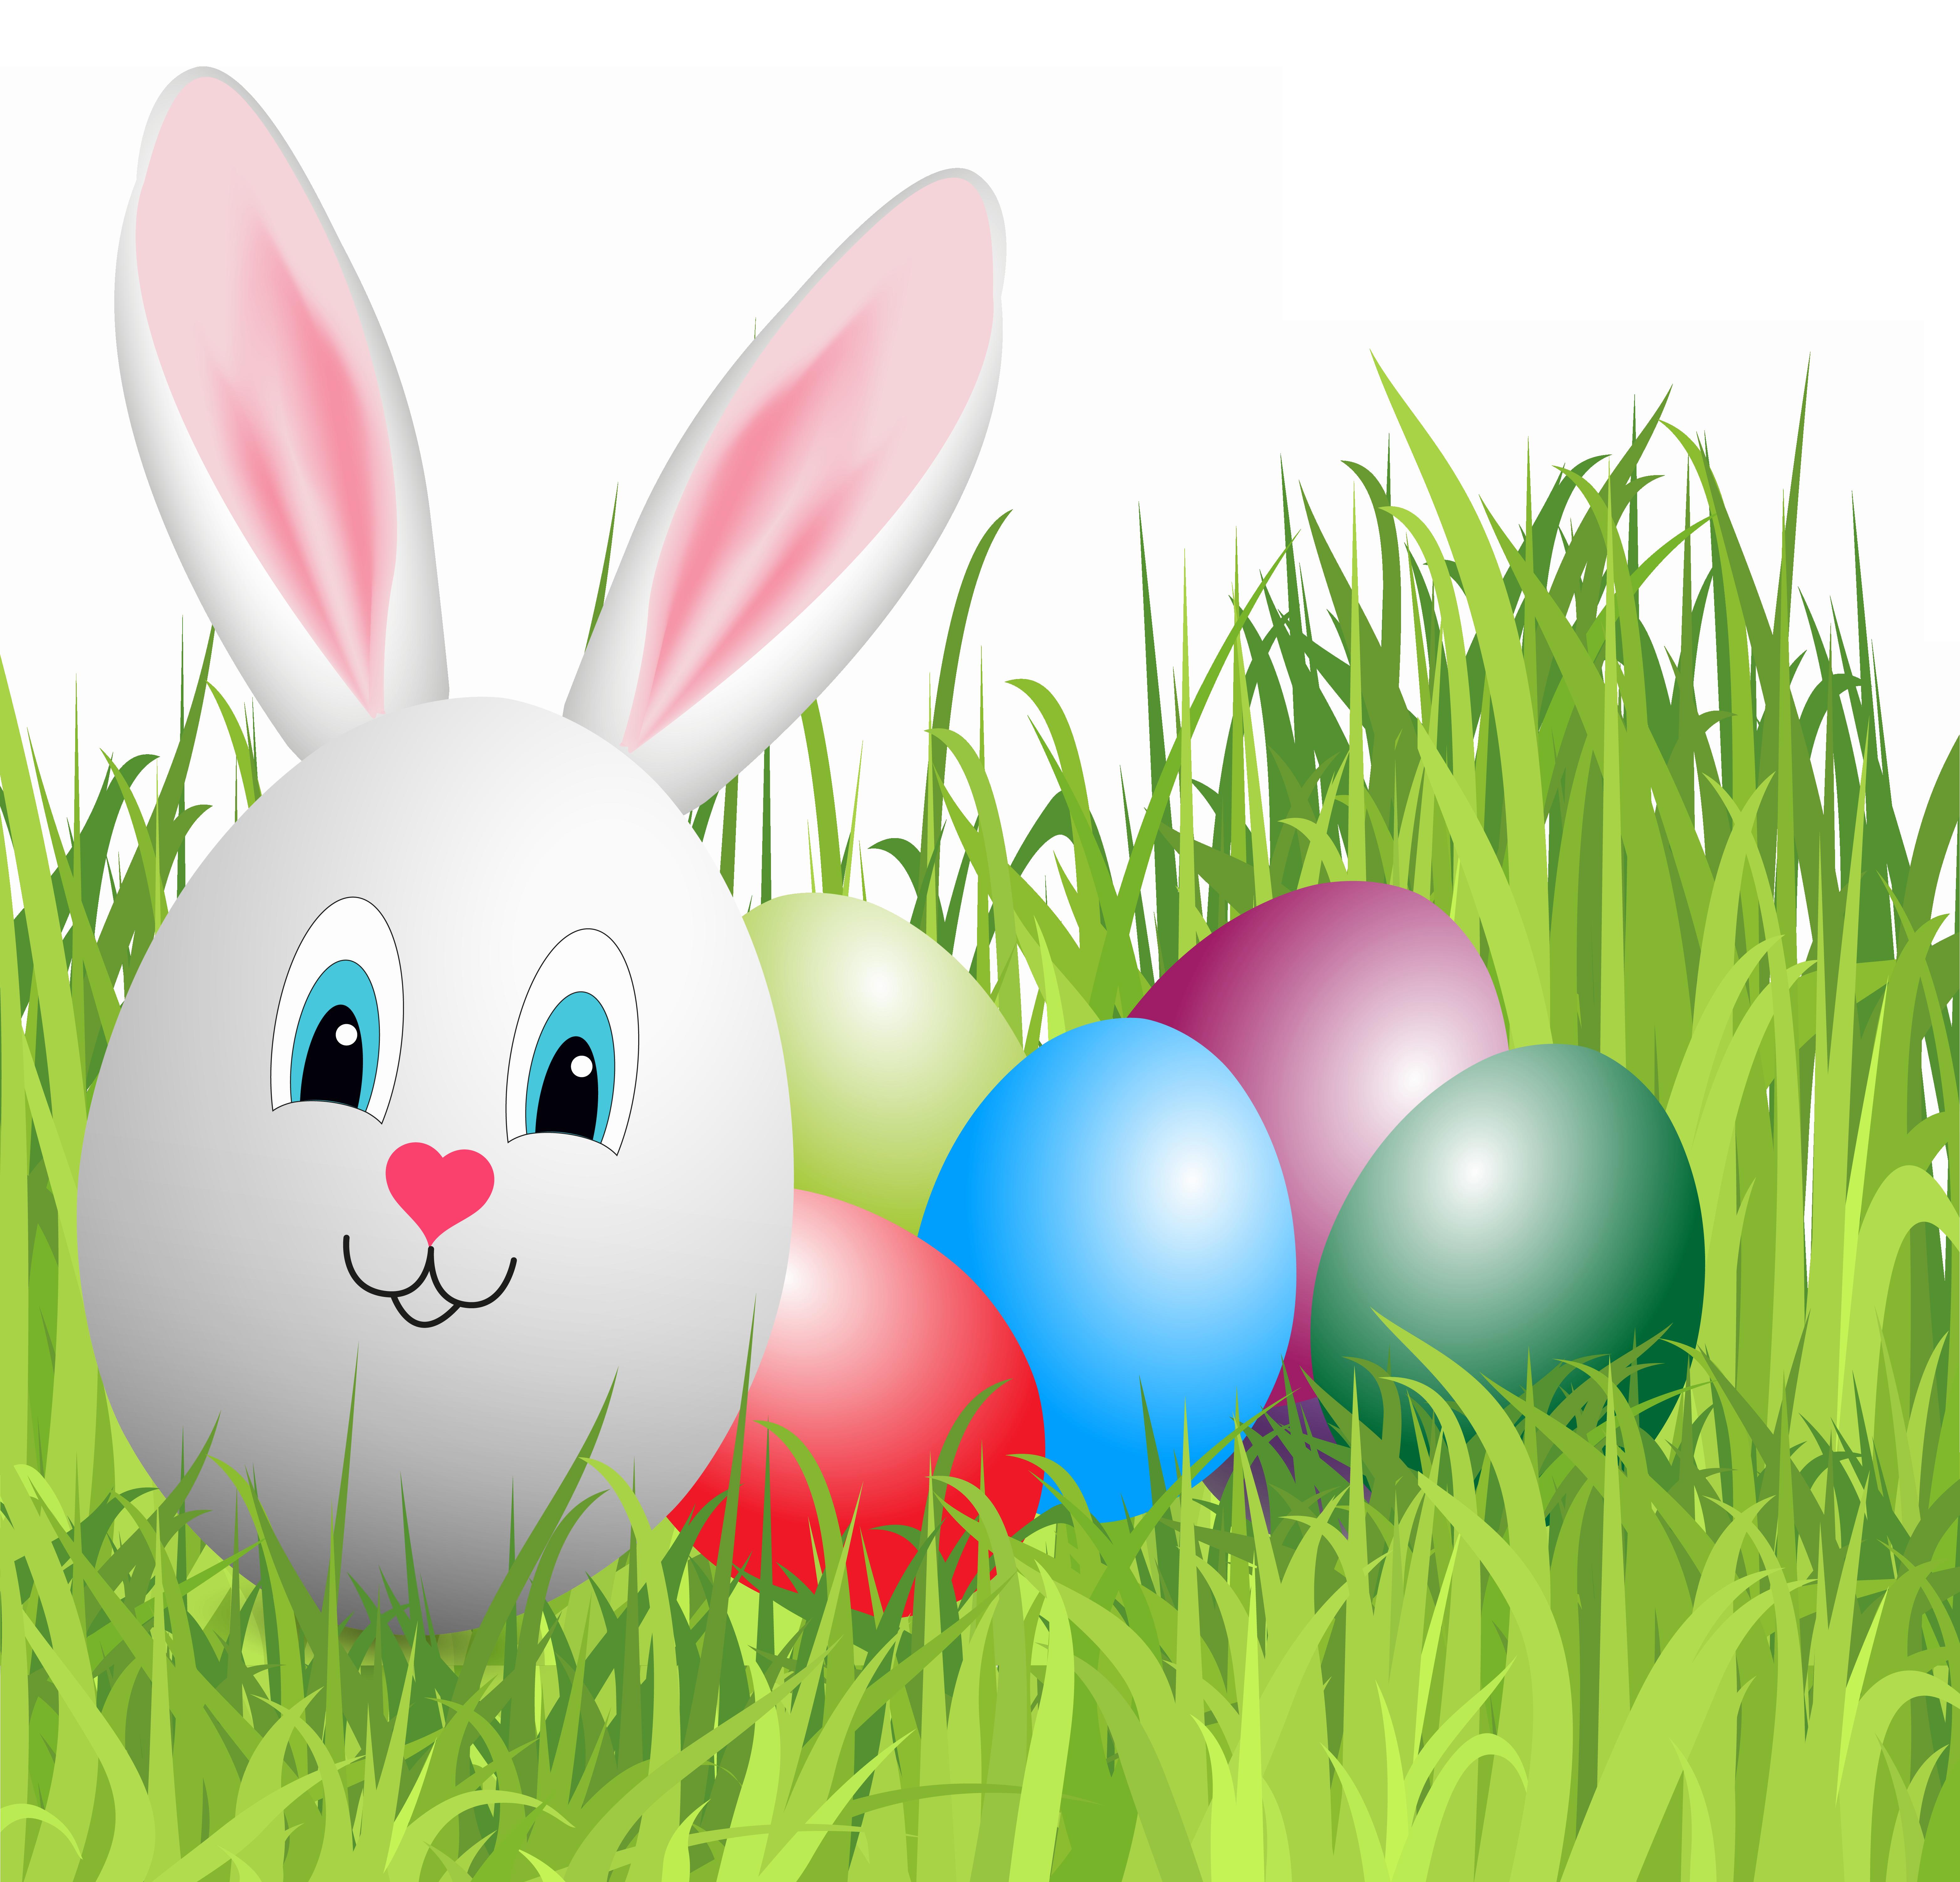 Bunny egg clipart jpg transparent Easter Grass with Bunny Egg PNG Clipart Image | Gallery ... jpg transparent